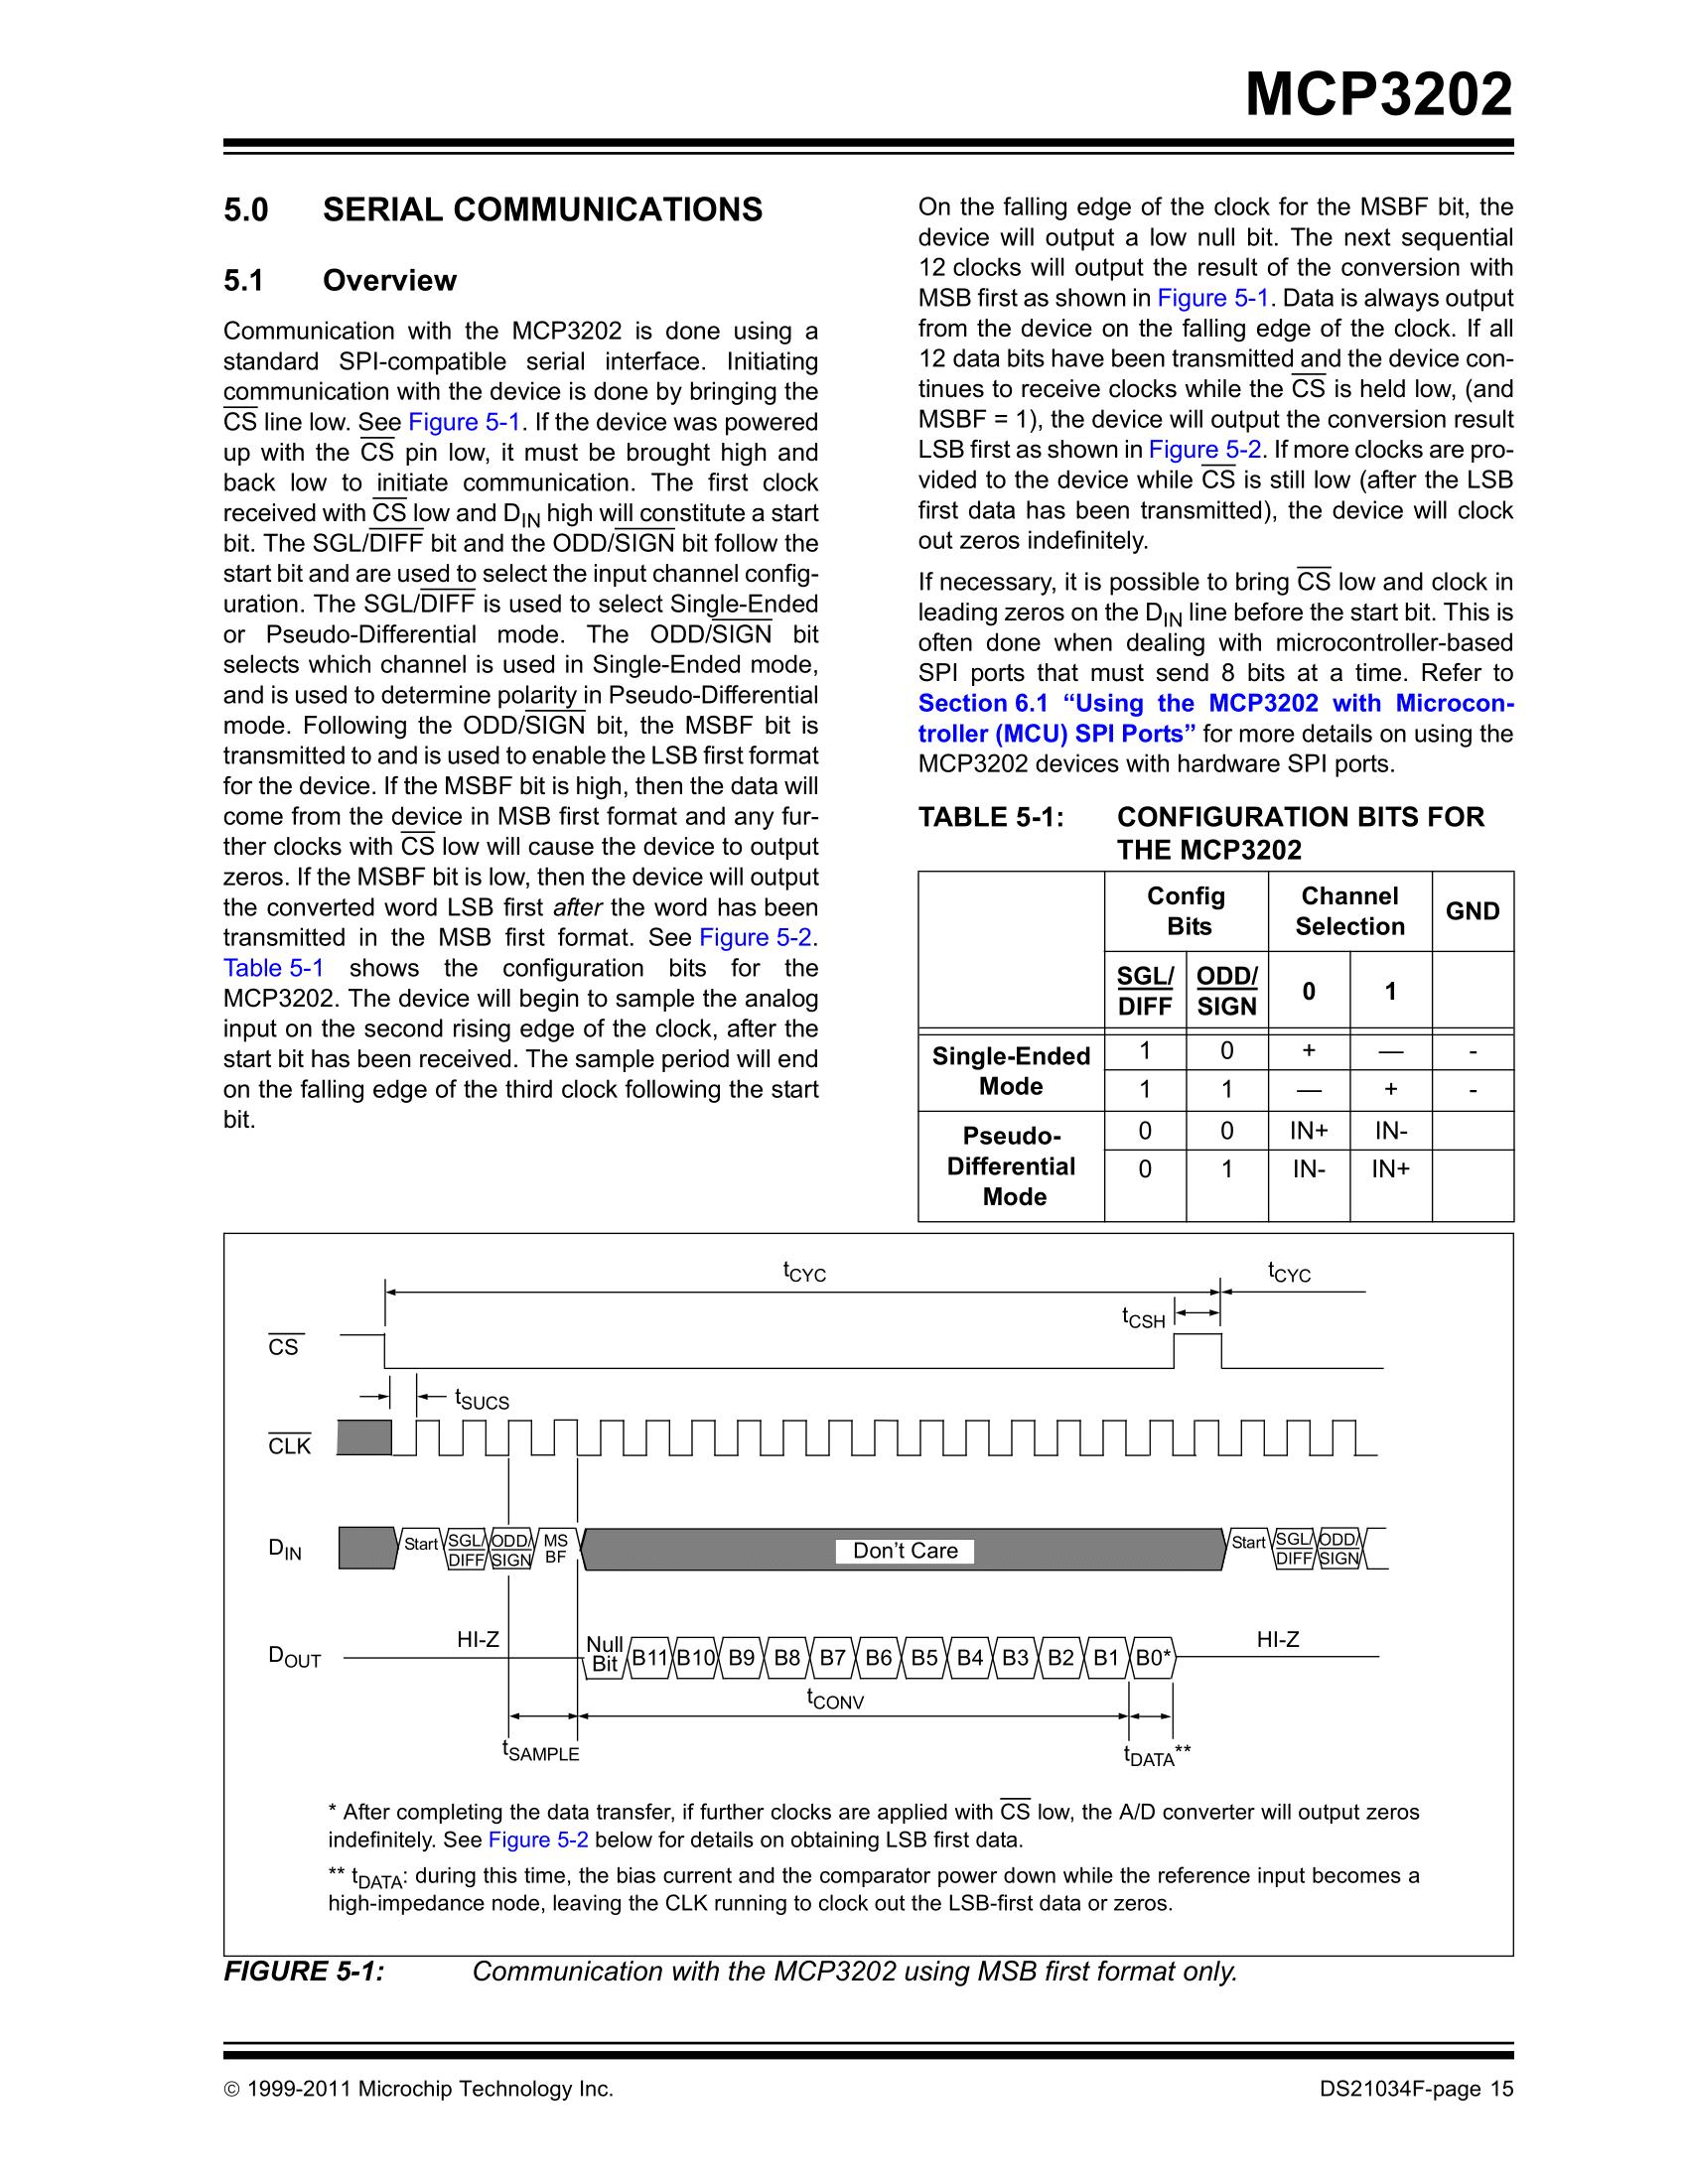 MCP3202 ADC, SPI and ESP - Hardware - Community